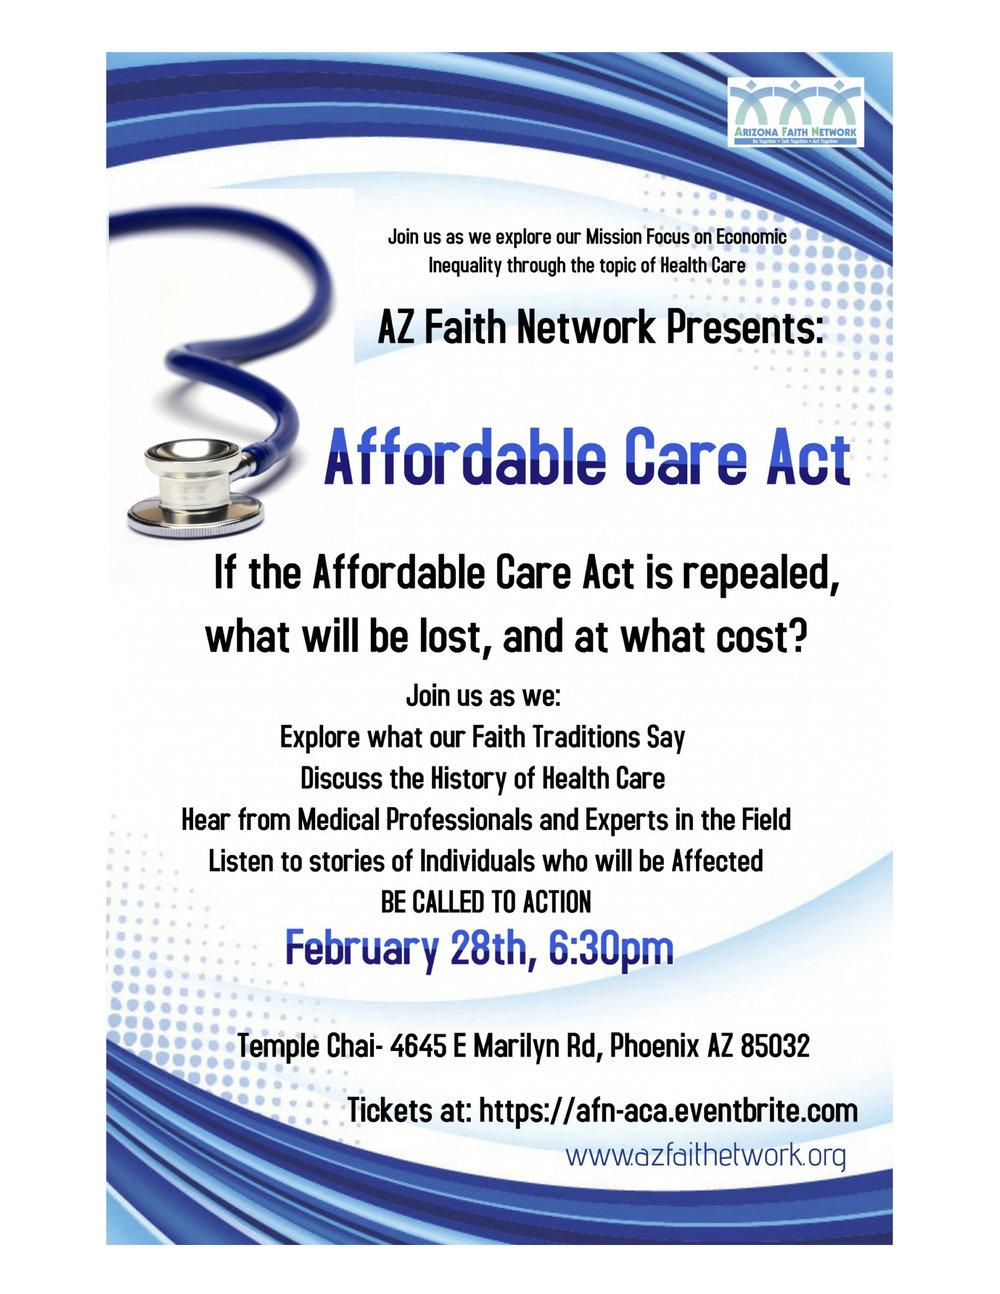 2017.02.28 ACA Event Flyer.jpg